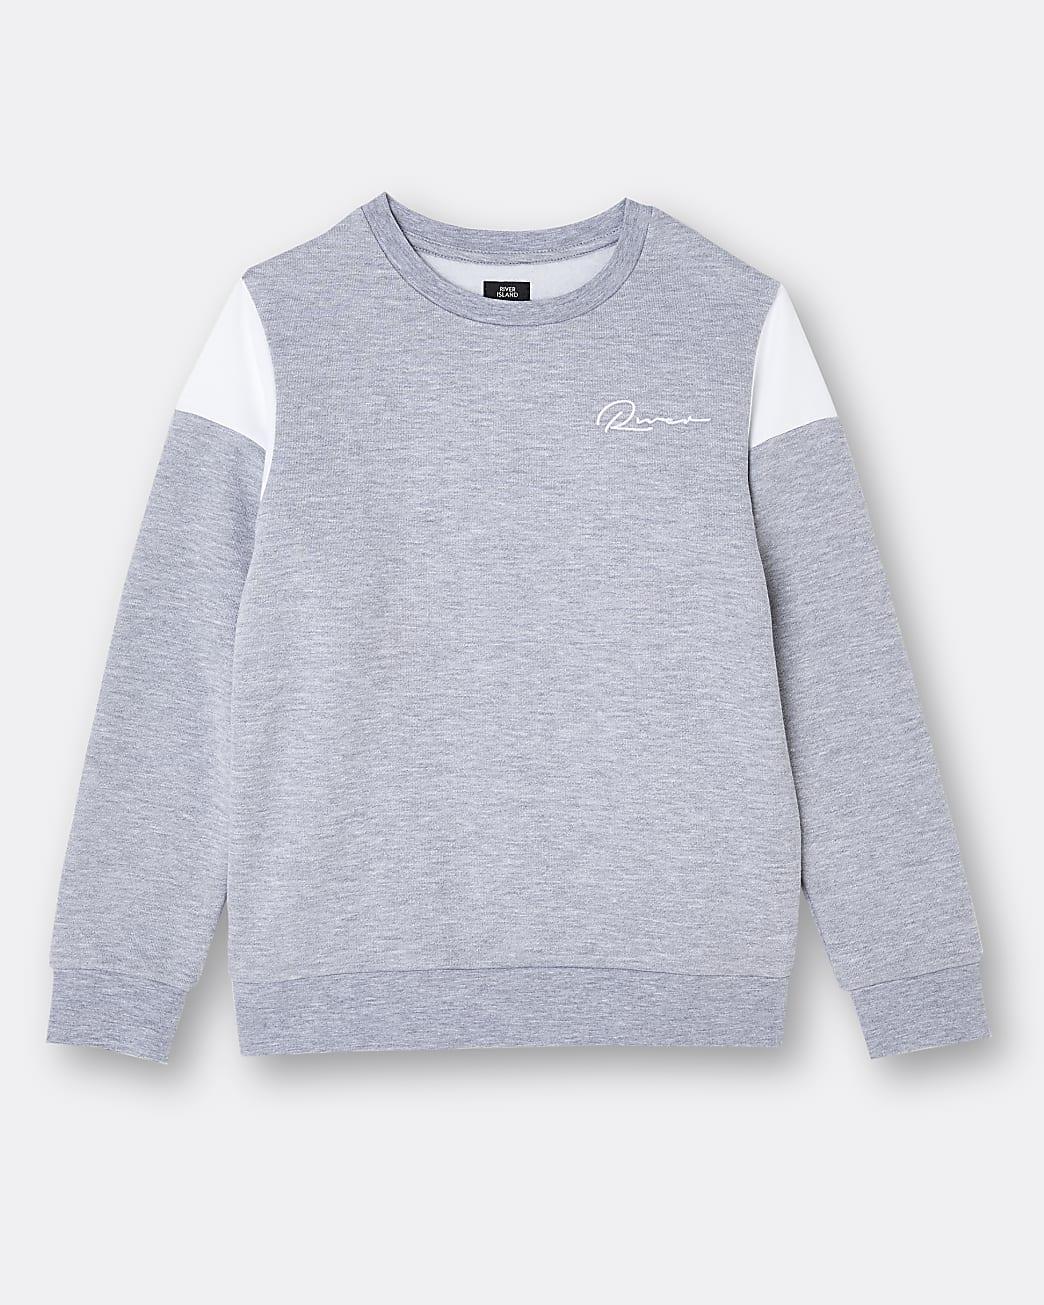 Age 13+ boys grey River sweatshirt